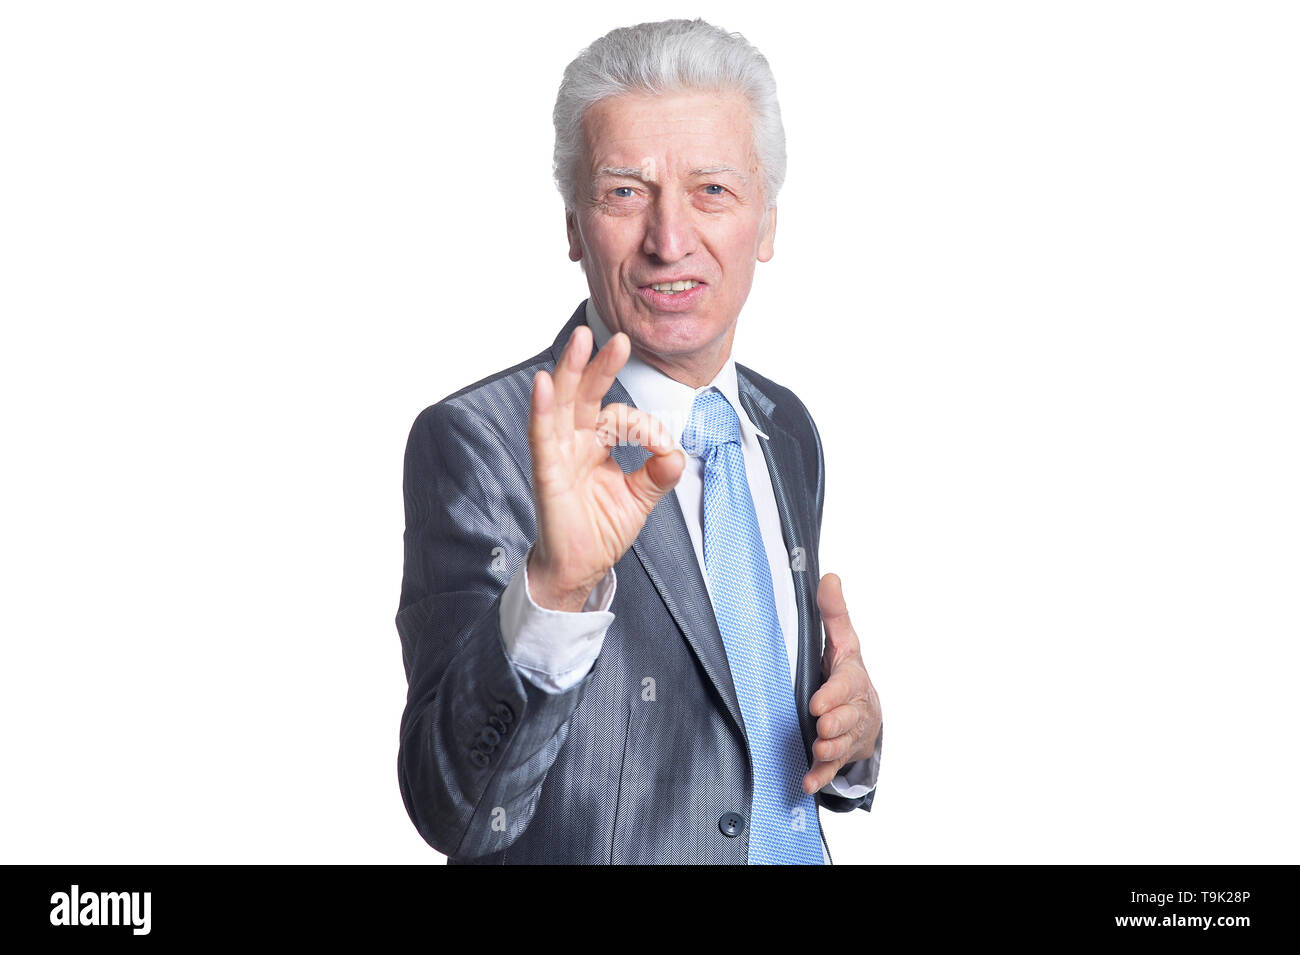 Smiling senior businessman showing ok sign against white - Stock Image